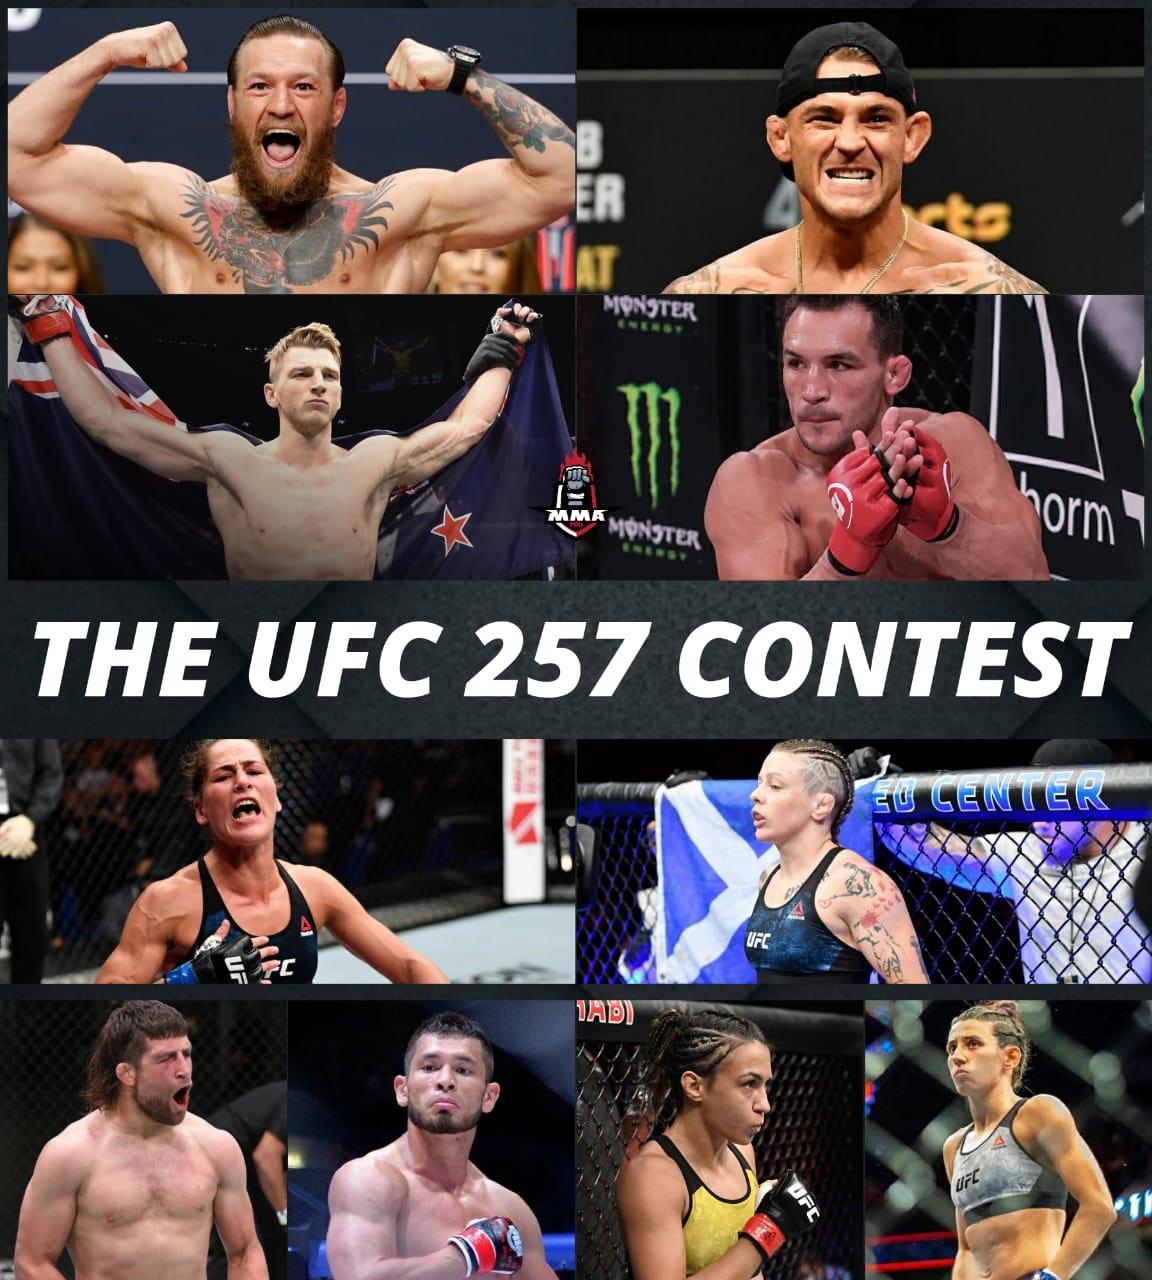 THE UFC 257 CONTEST | MMA INDIA SHOW - UFC 257